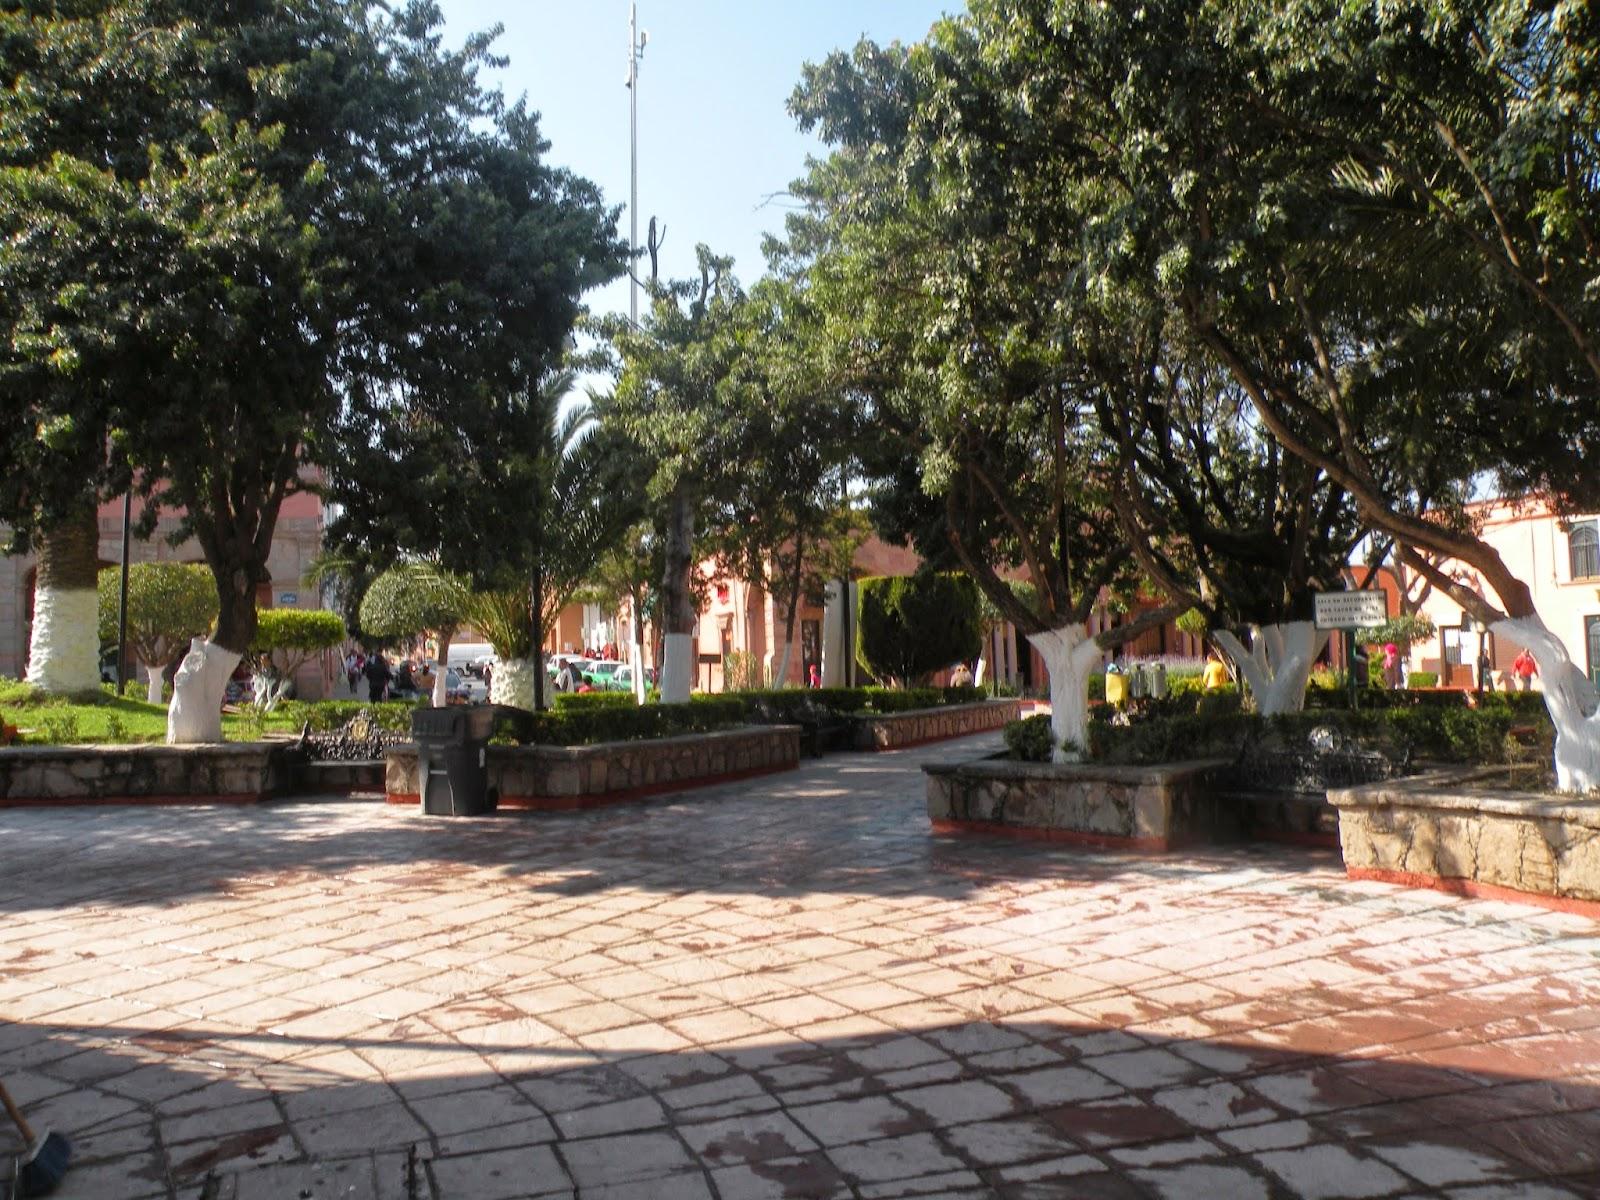 El blog de PatyLu: La Ruta de la Plata ..¡¡ San Luis de la Paz ...